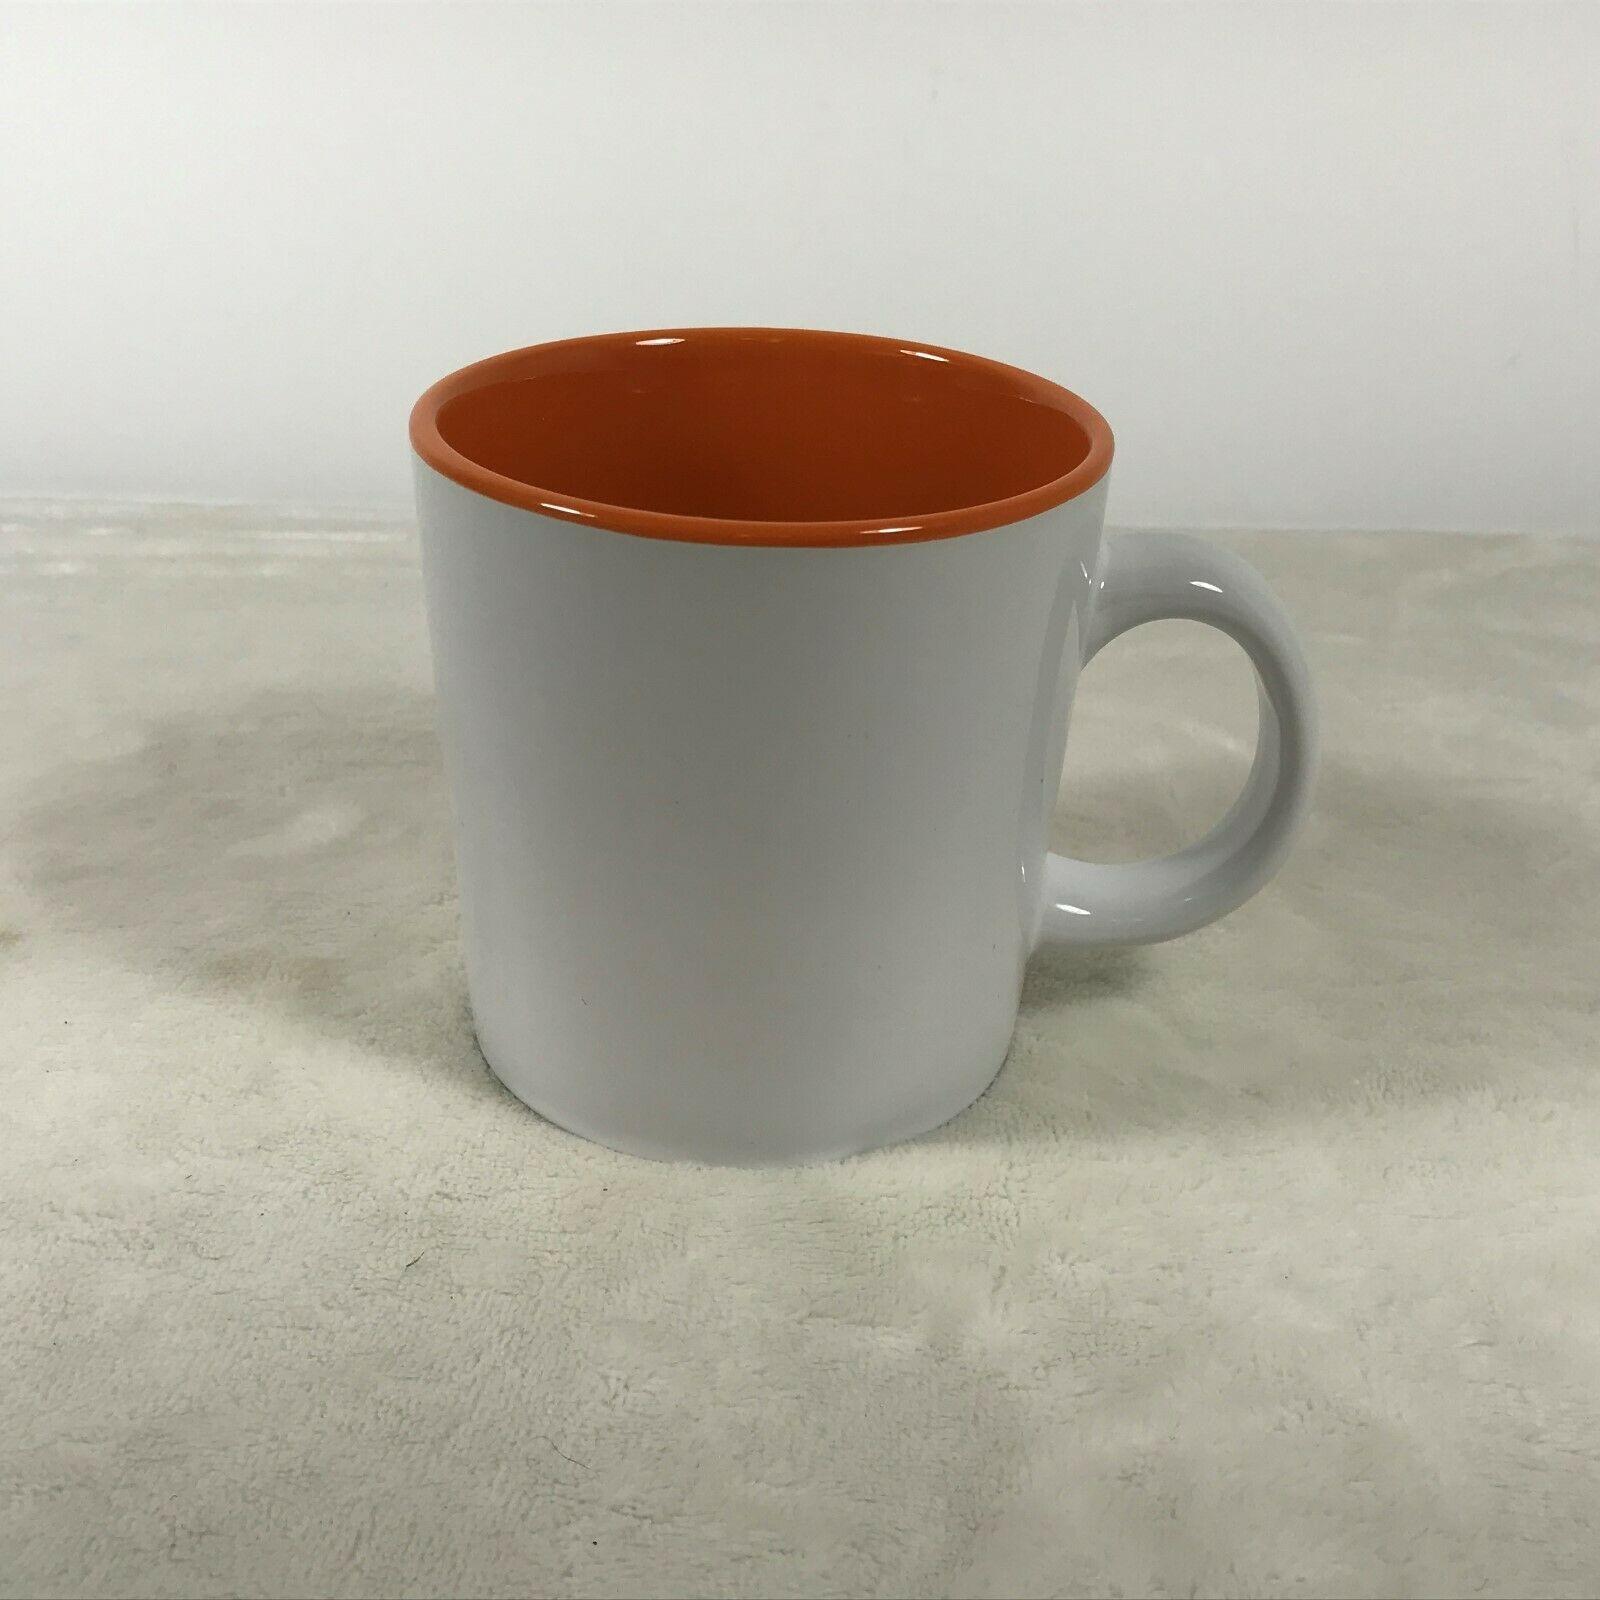 Dunkin Donuts Coffee Mug Bakery Series - Mugs, Cups